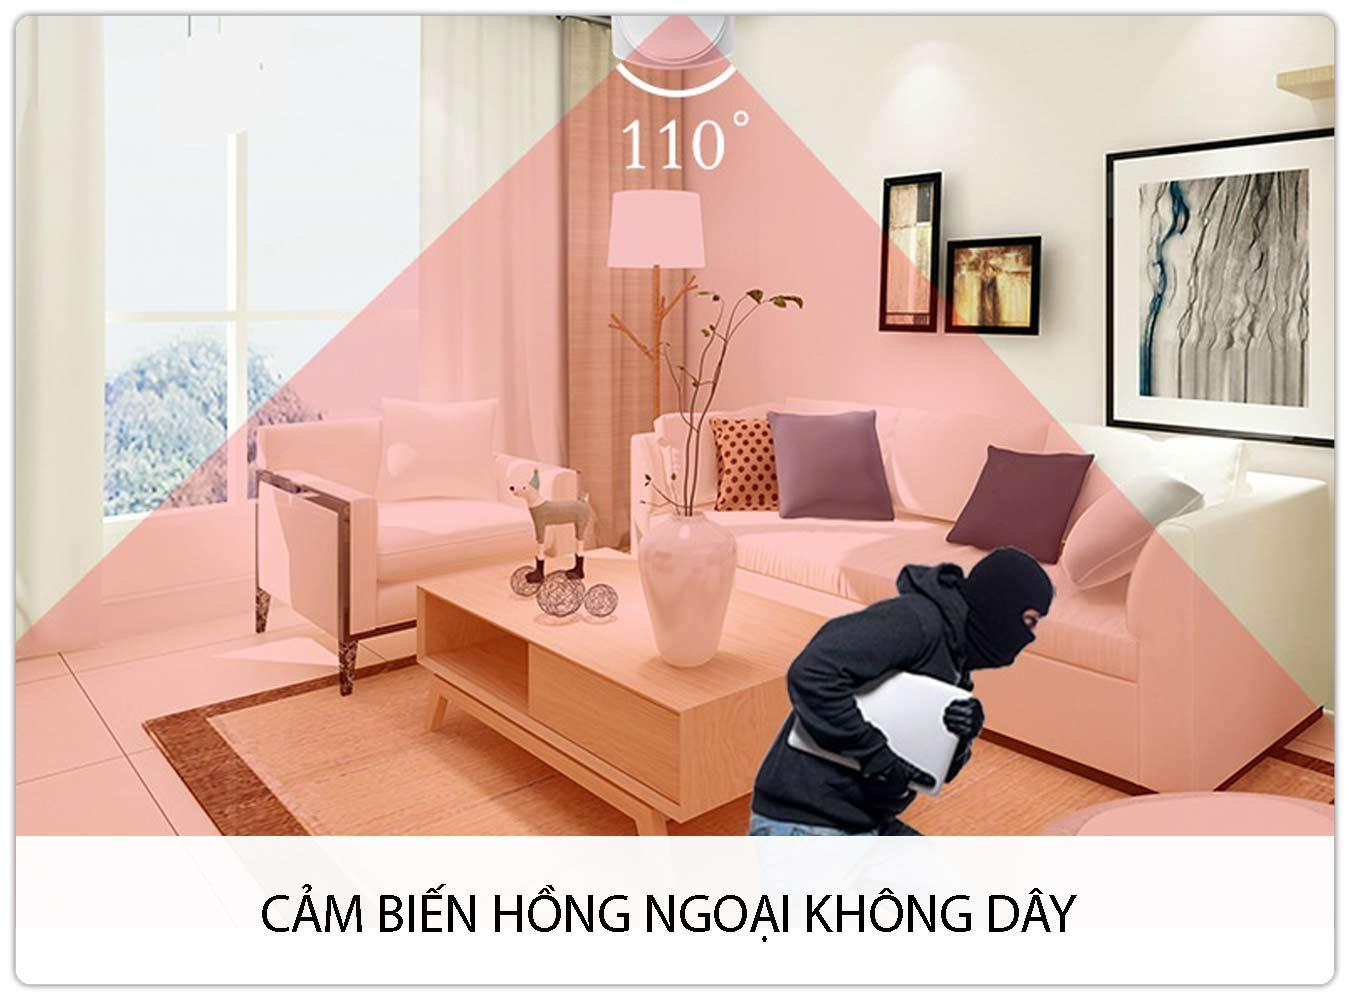 Cam-bien-hong-ngoai-khong-day